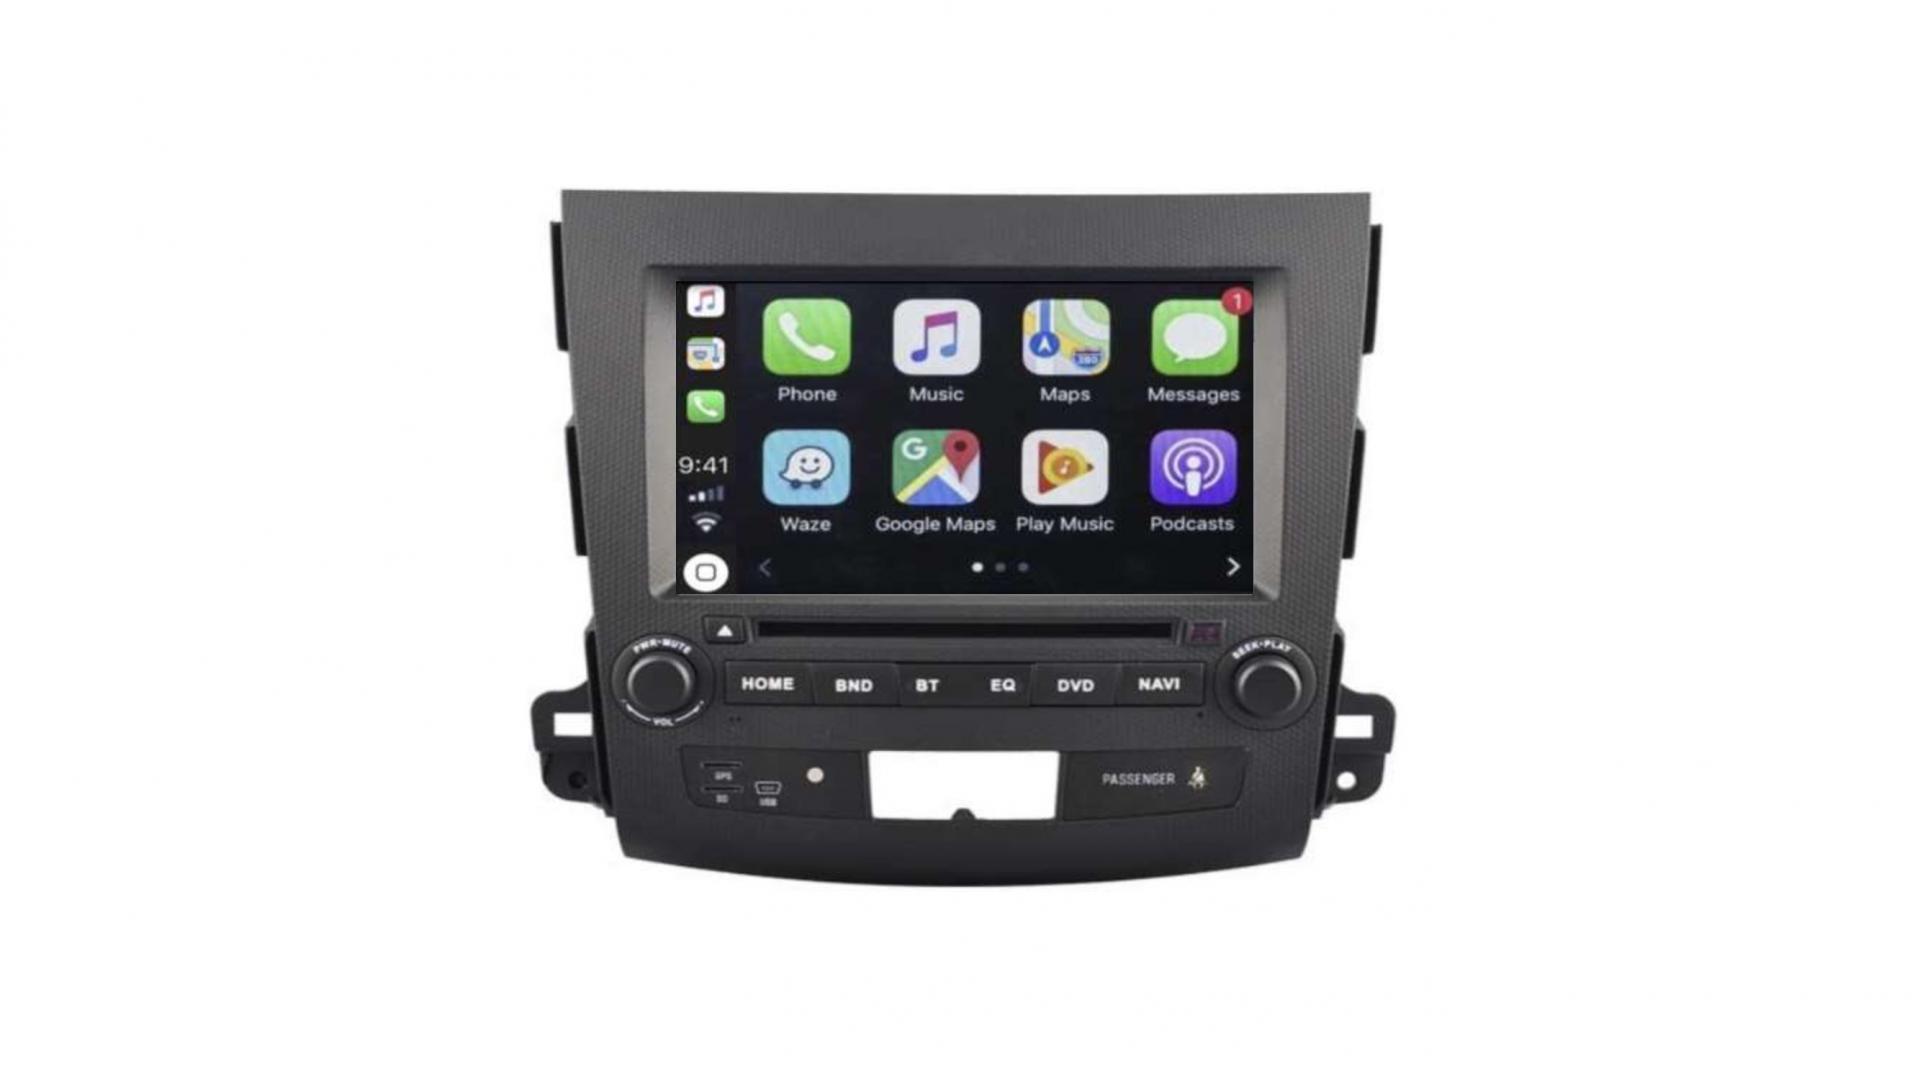 Autoradio gps bluetooth peugeot 4007 android auto carplay camera de recul commande au volant1